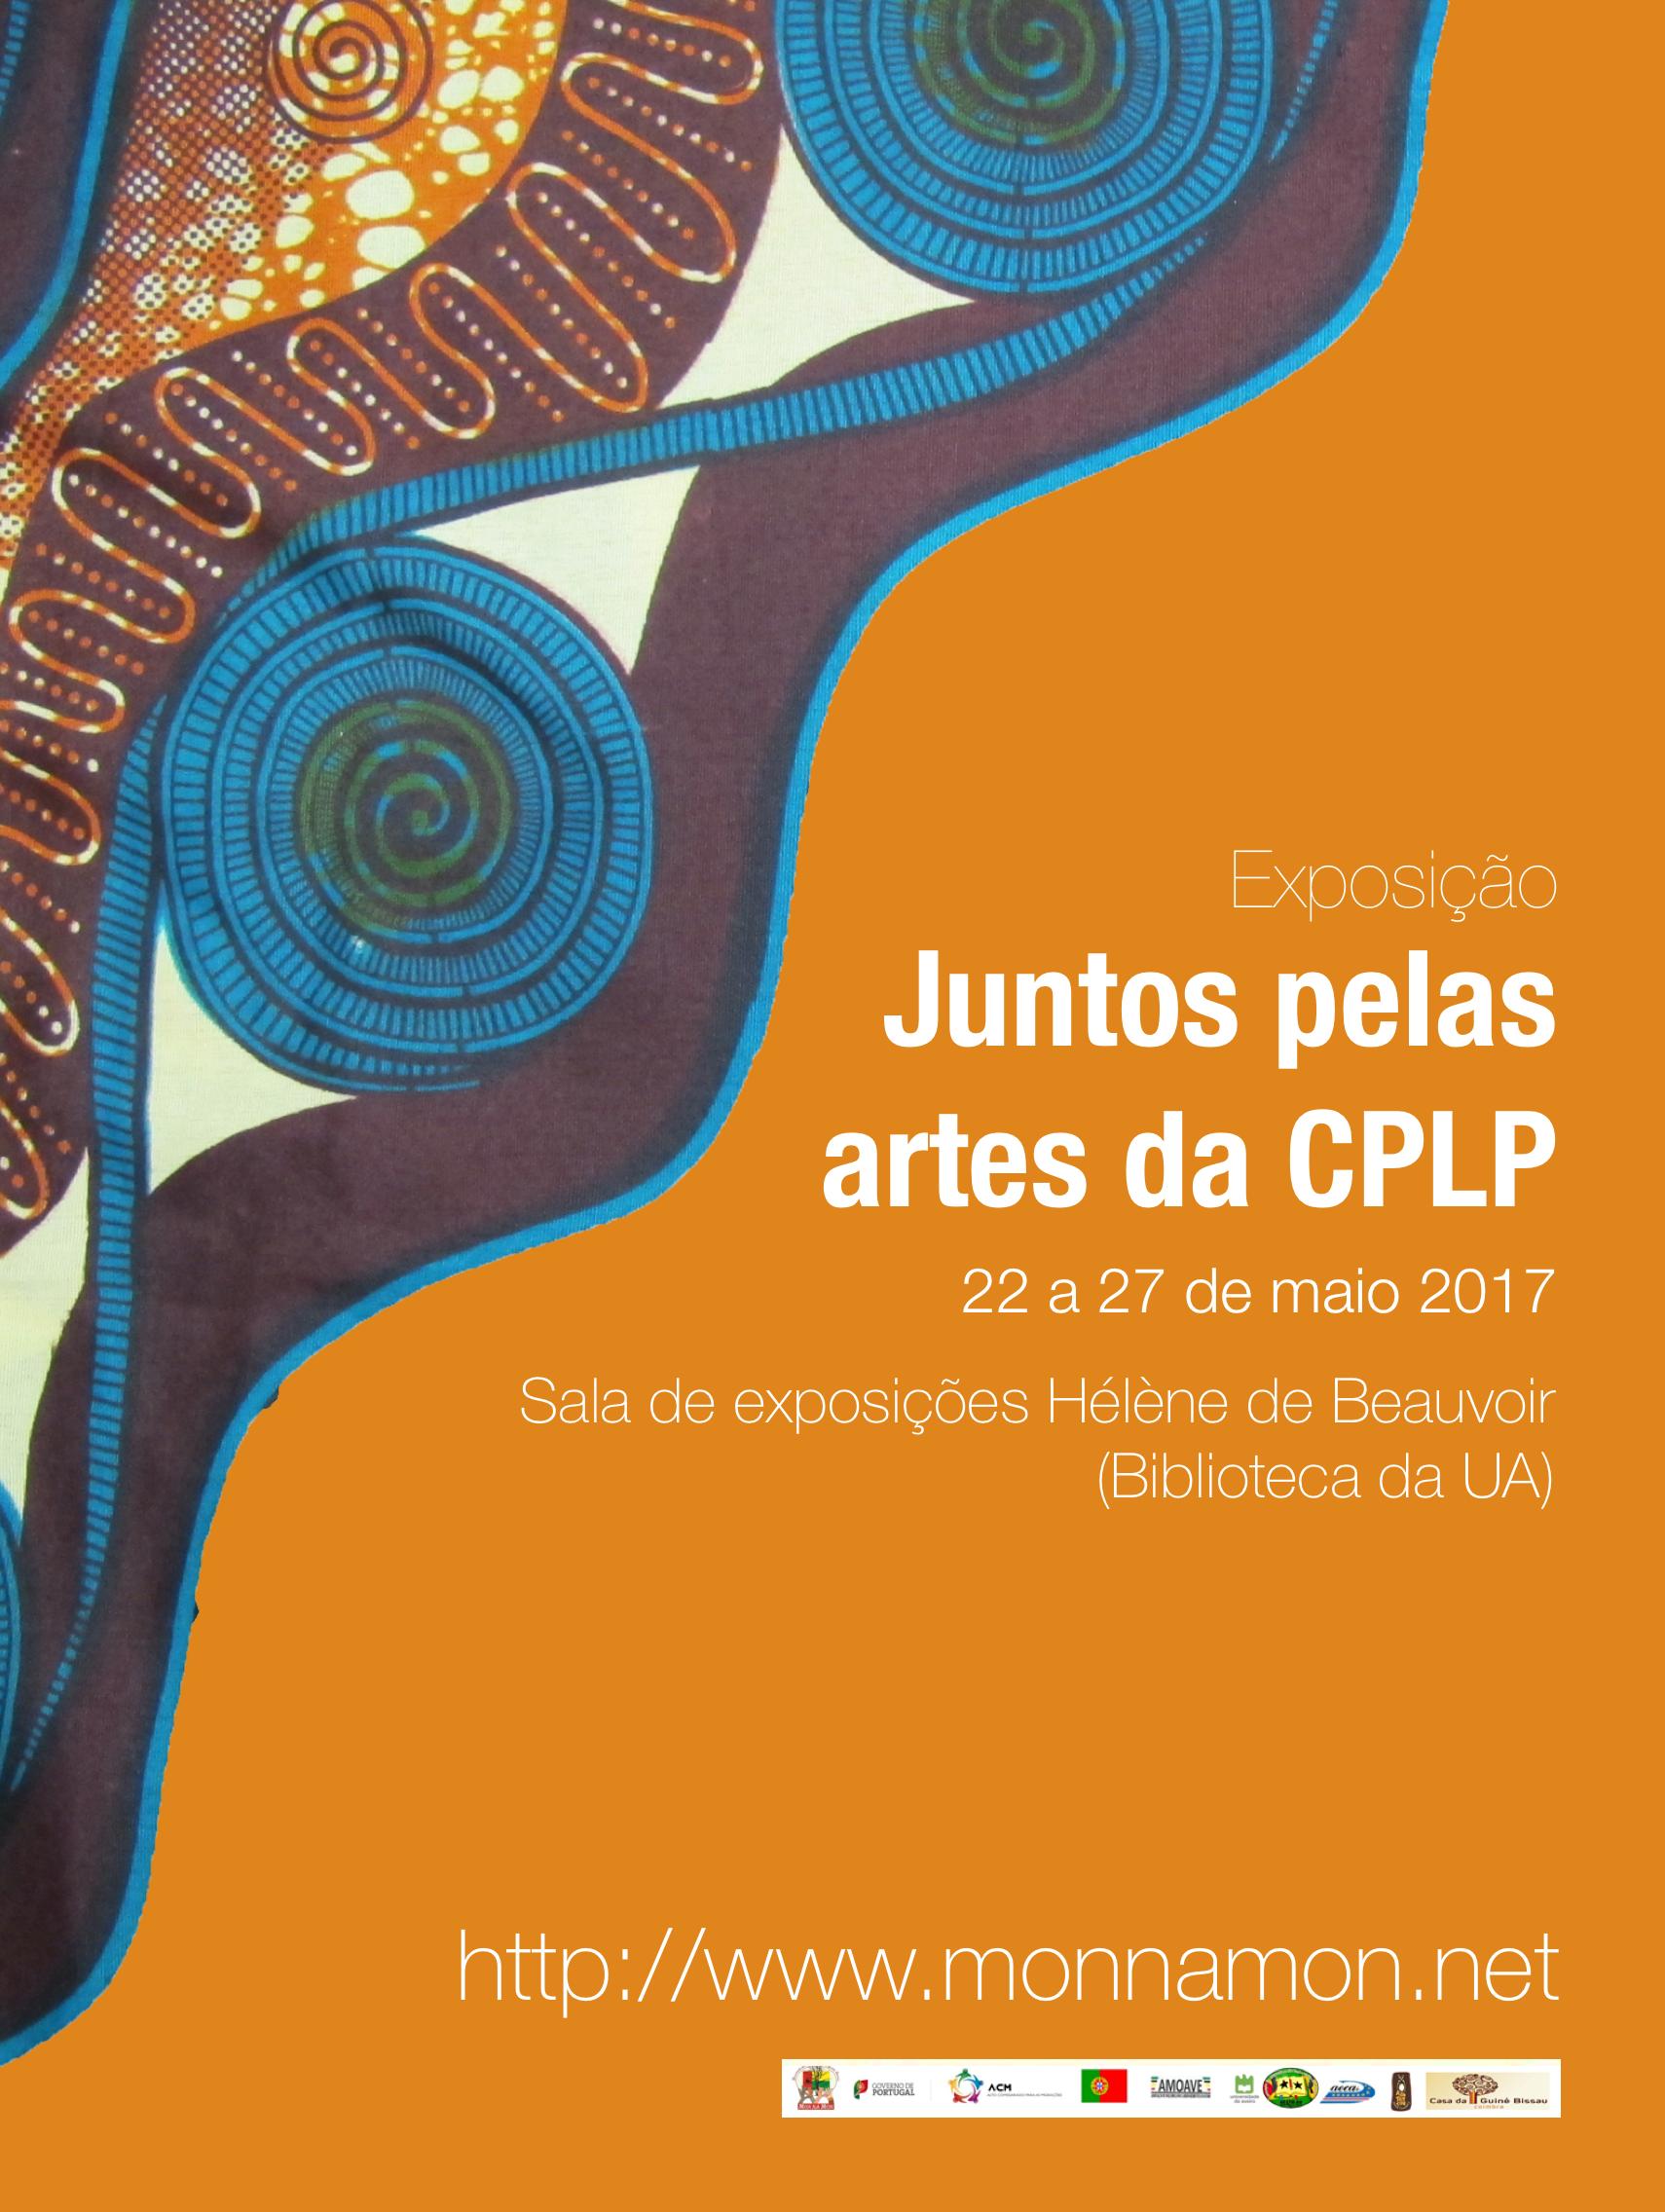 Juntos pelas artes da CPLP